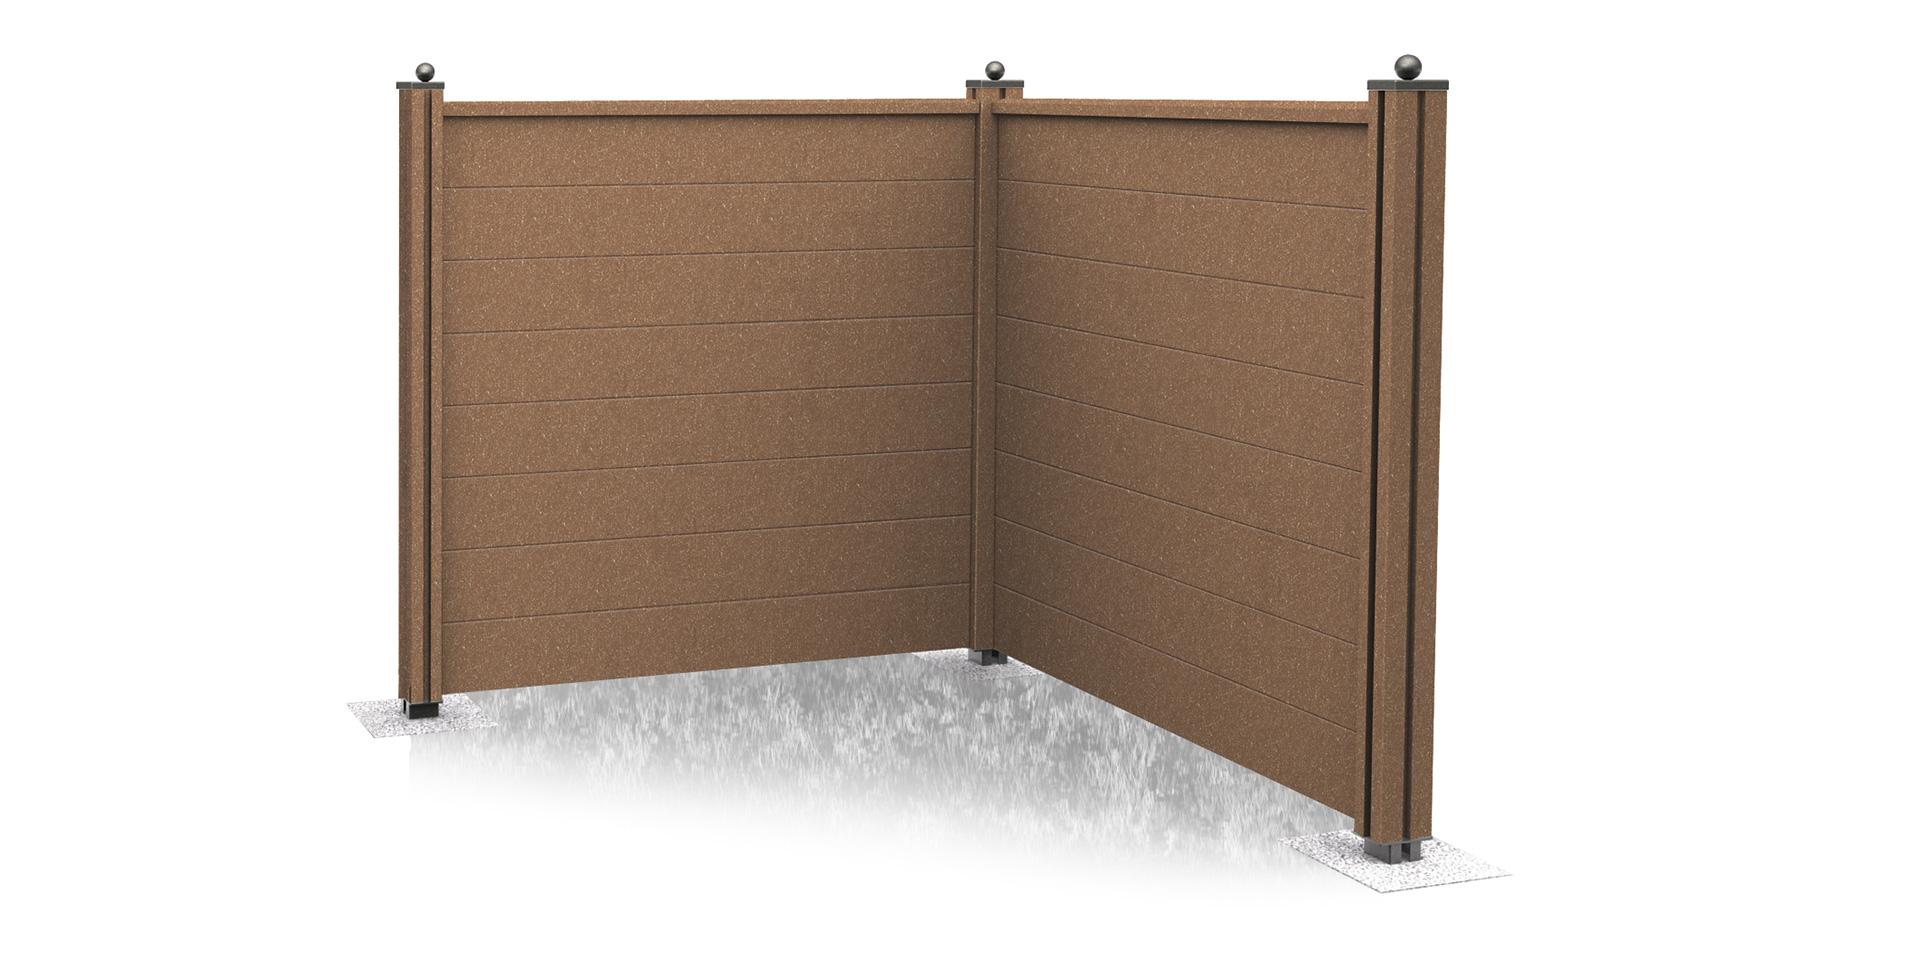 le syst me de terrasse pare vue. Black Bedroom Furniture Sets. Home Design Ideas